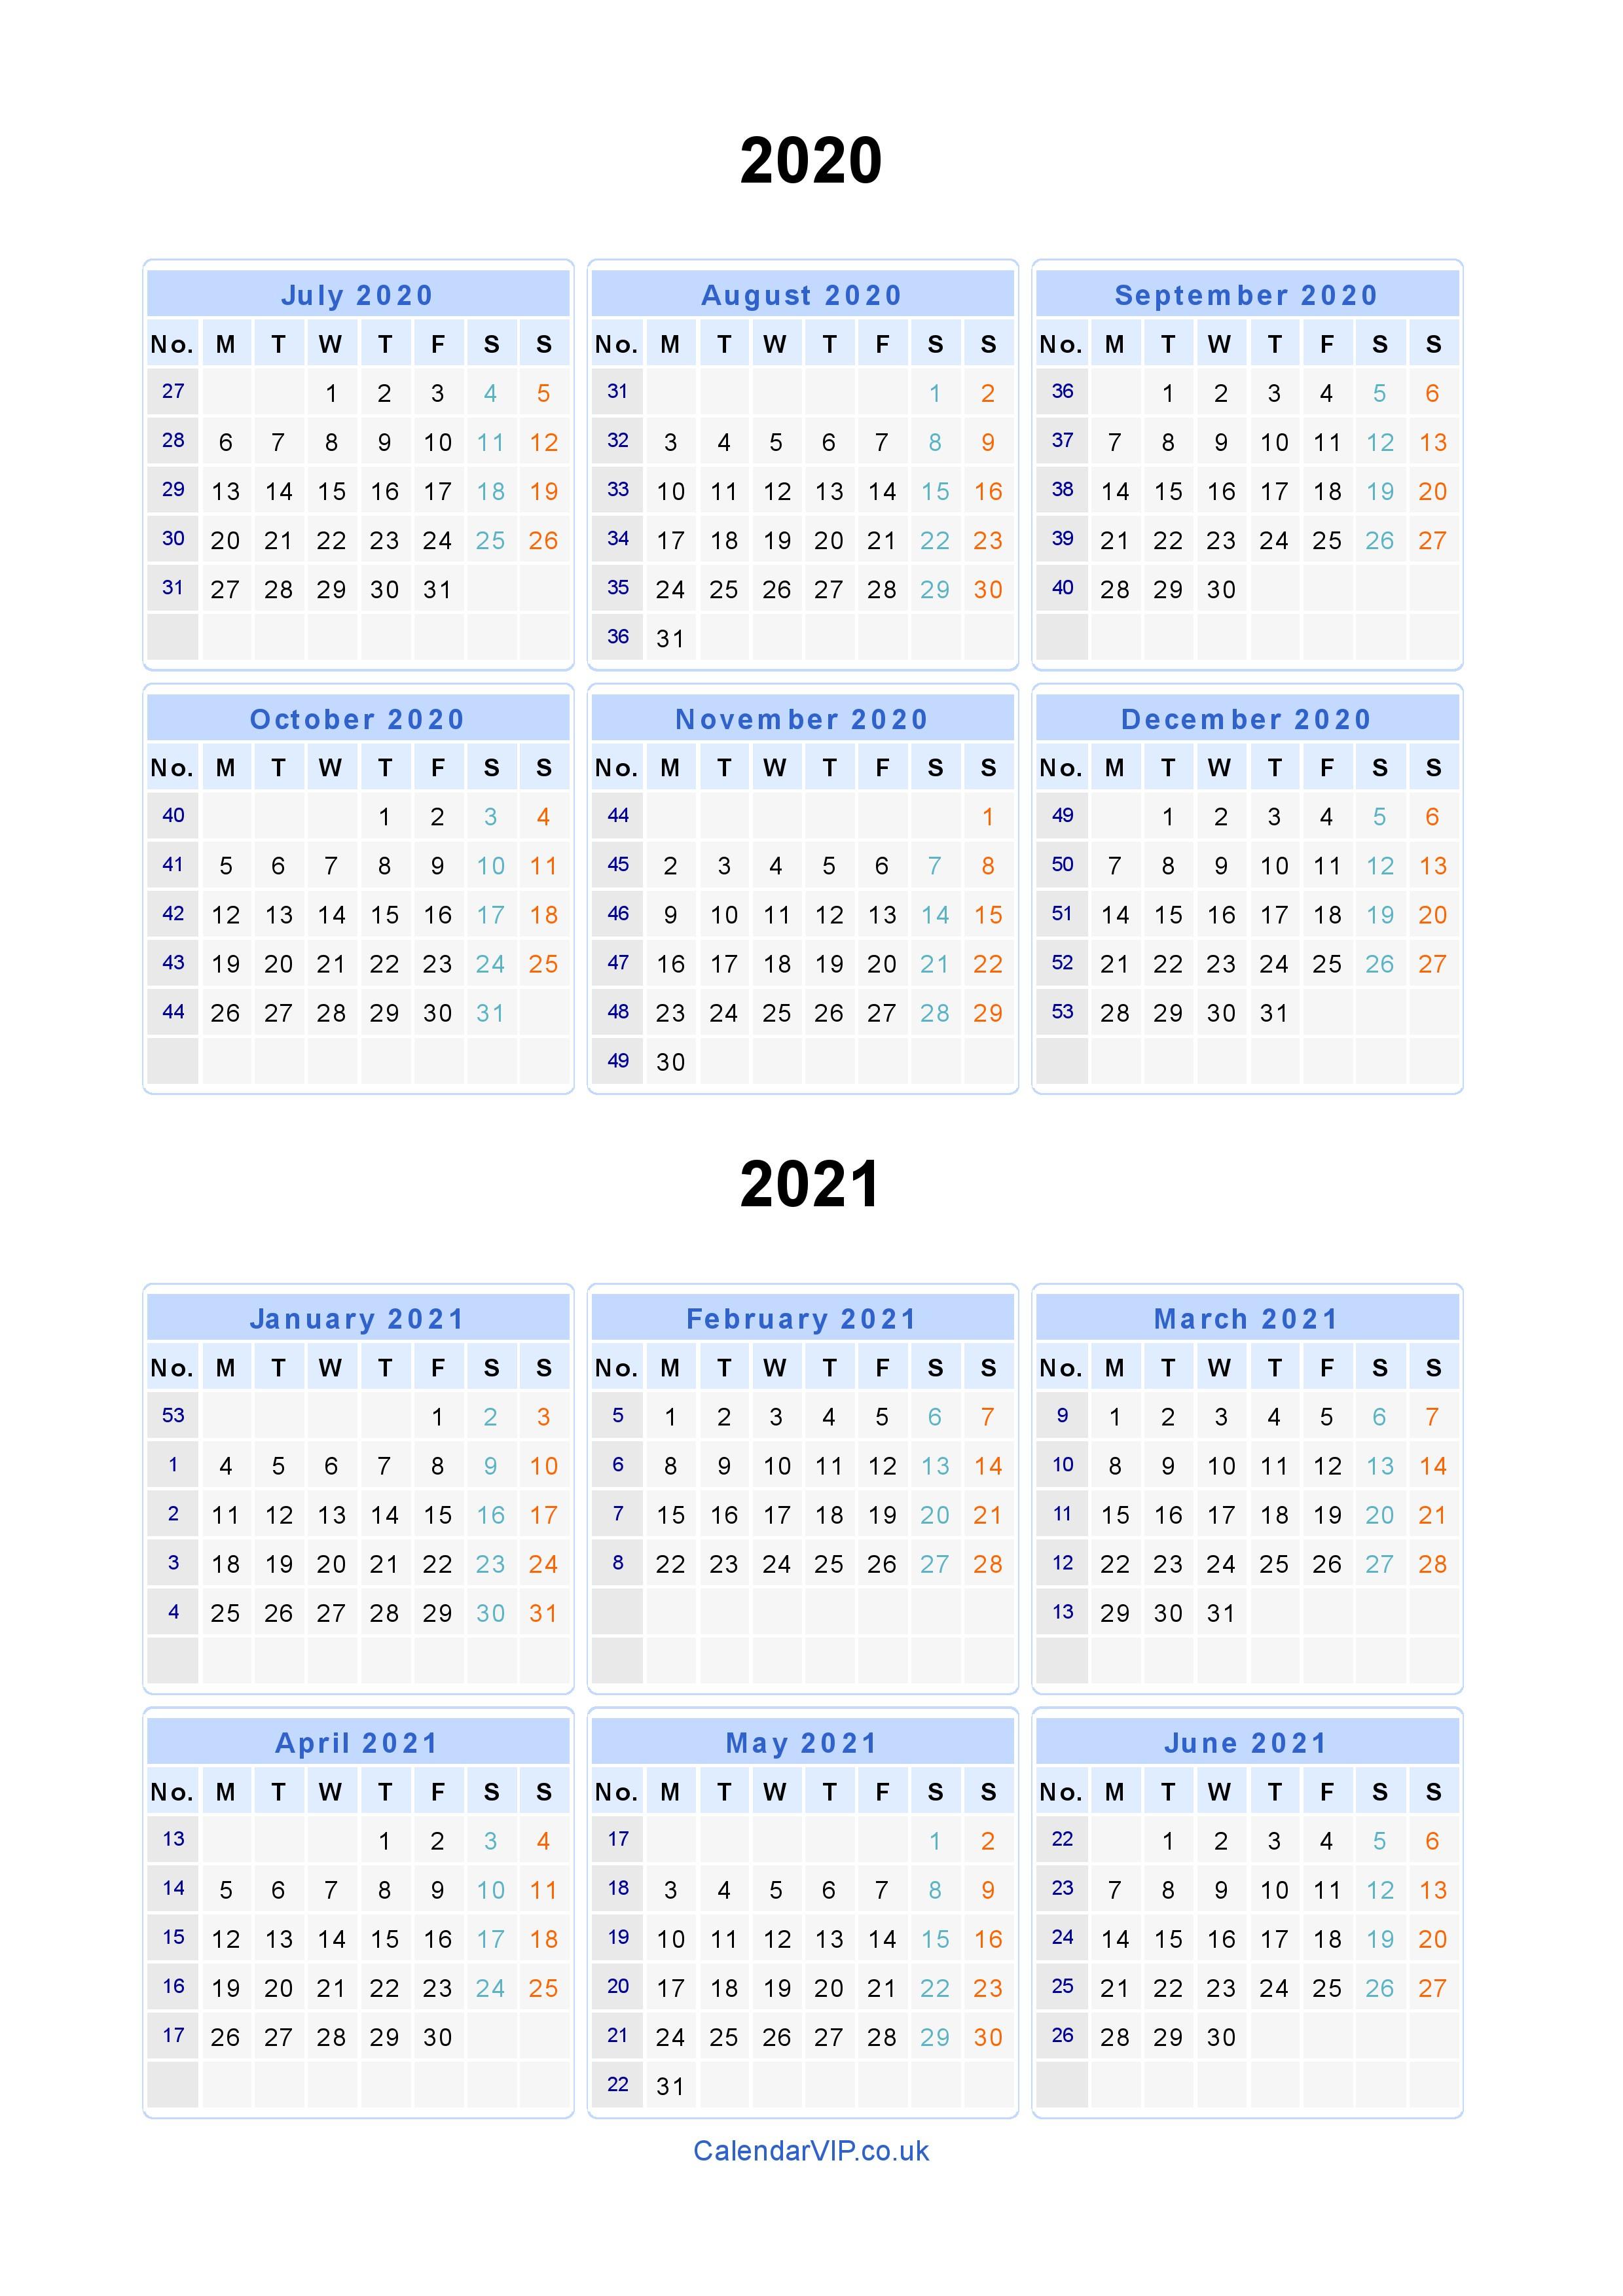 Split Year Calendars 2020 2021 - Calendar From July 2020 To June 2021